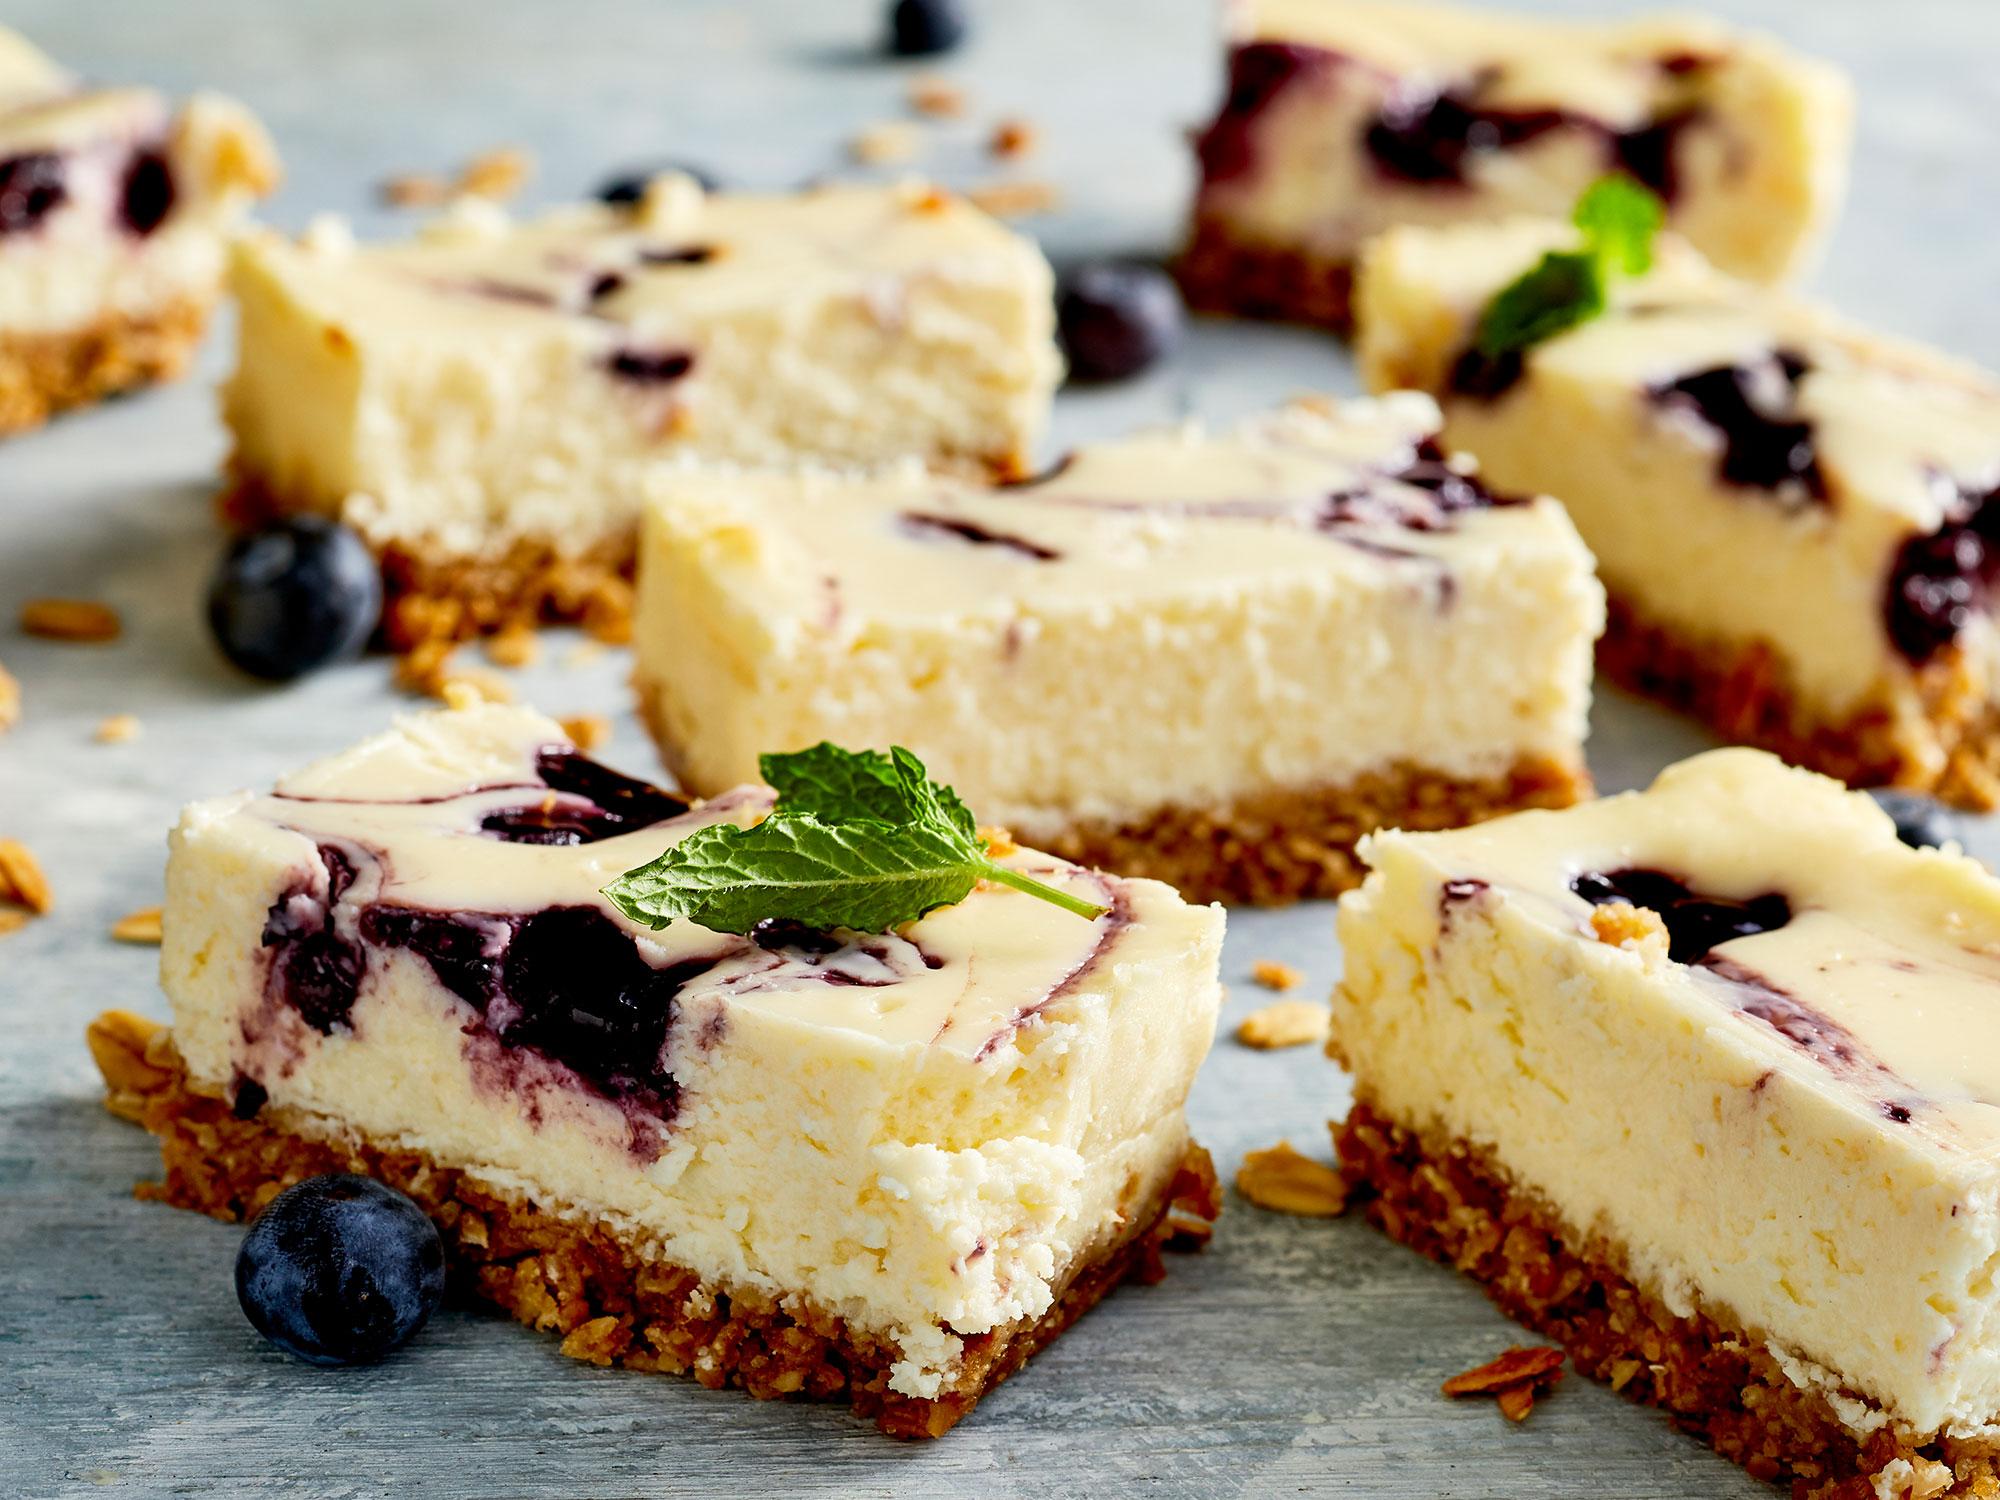 Video: Greek Yogurt Blueberry Cheesecake Bars